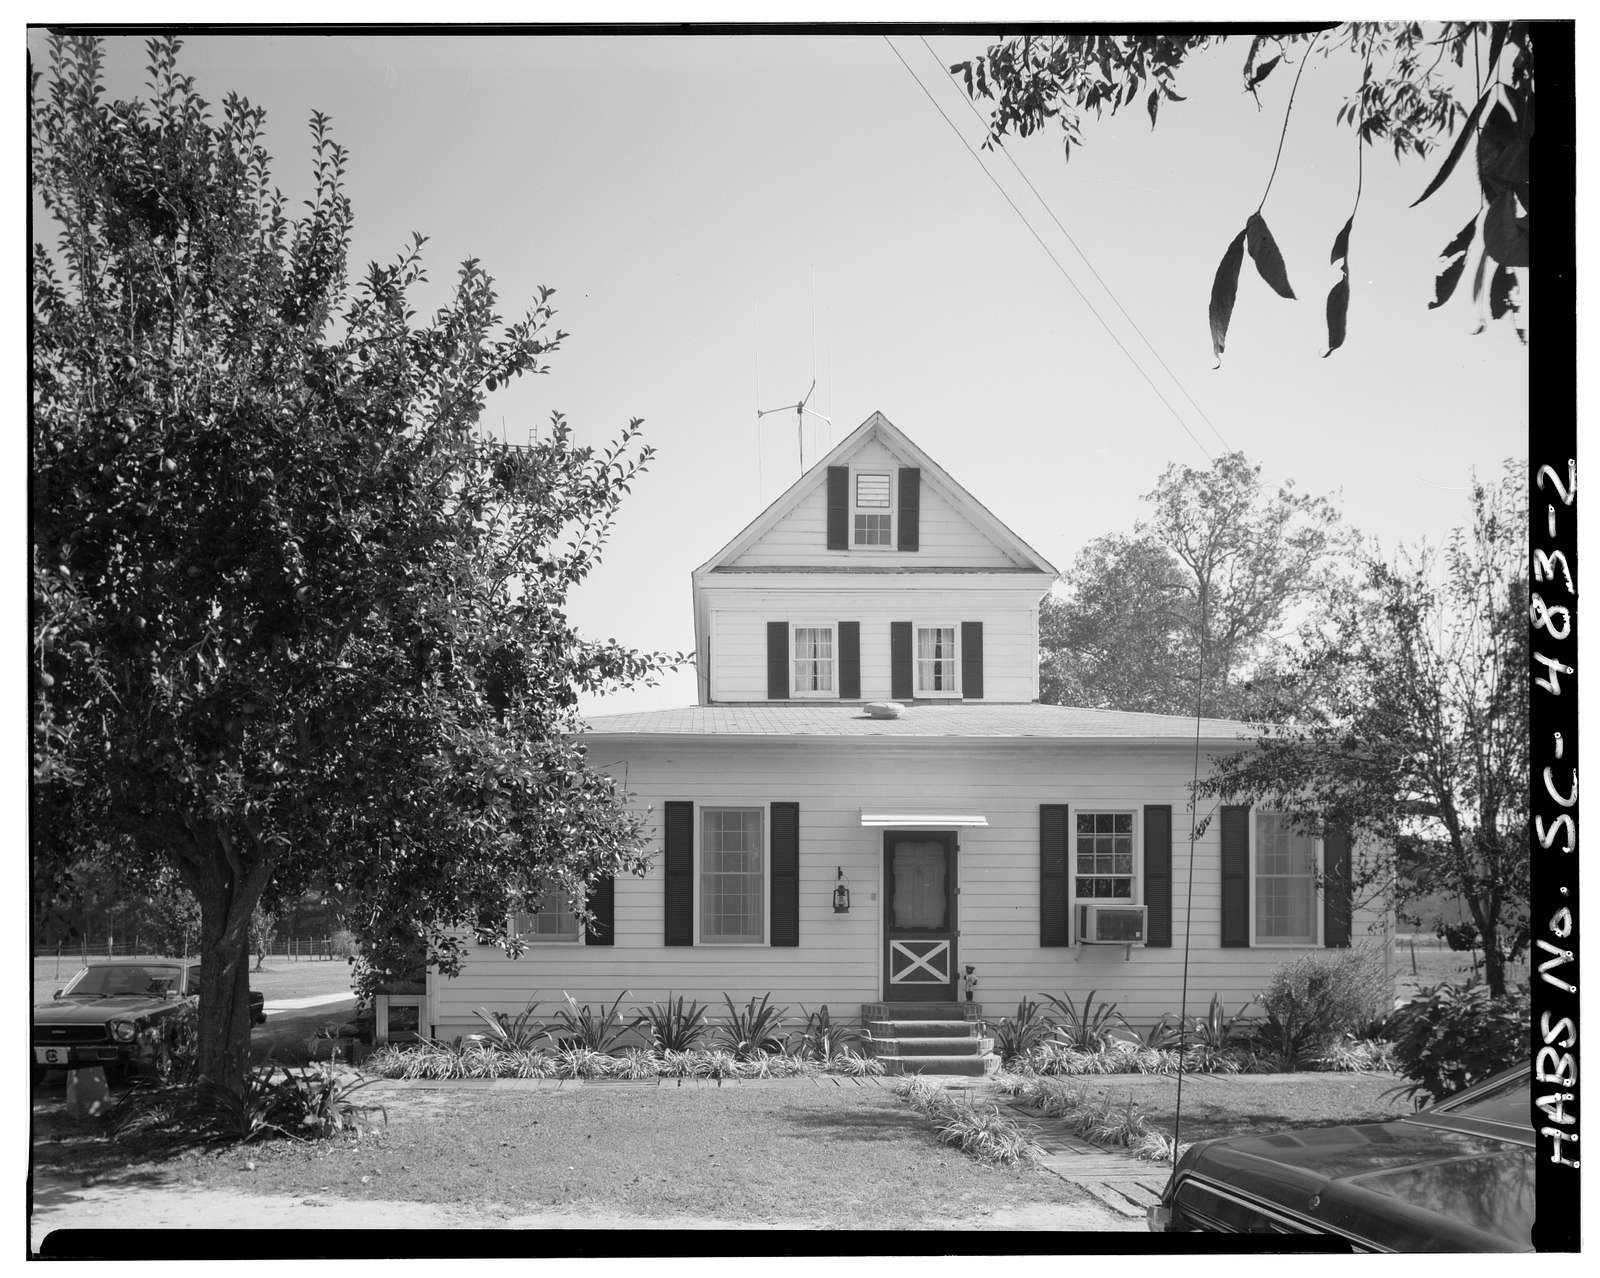 Stephan Williams House, U.S. Route 176, Holly Hill, Orangeburg County, SC